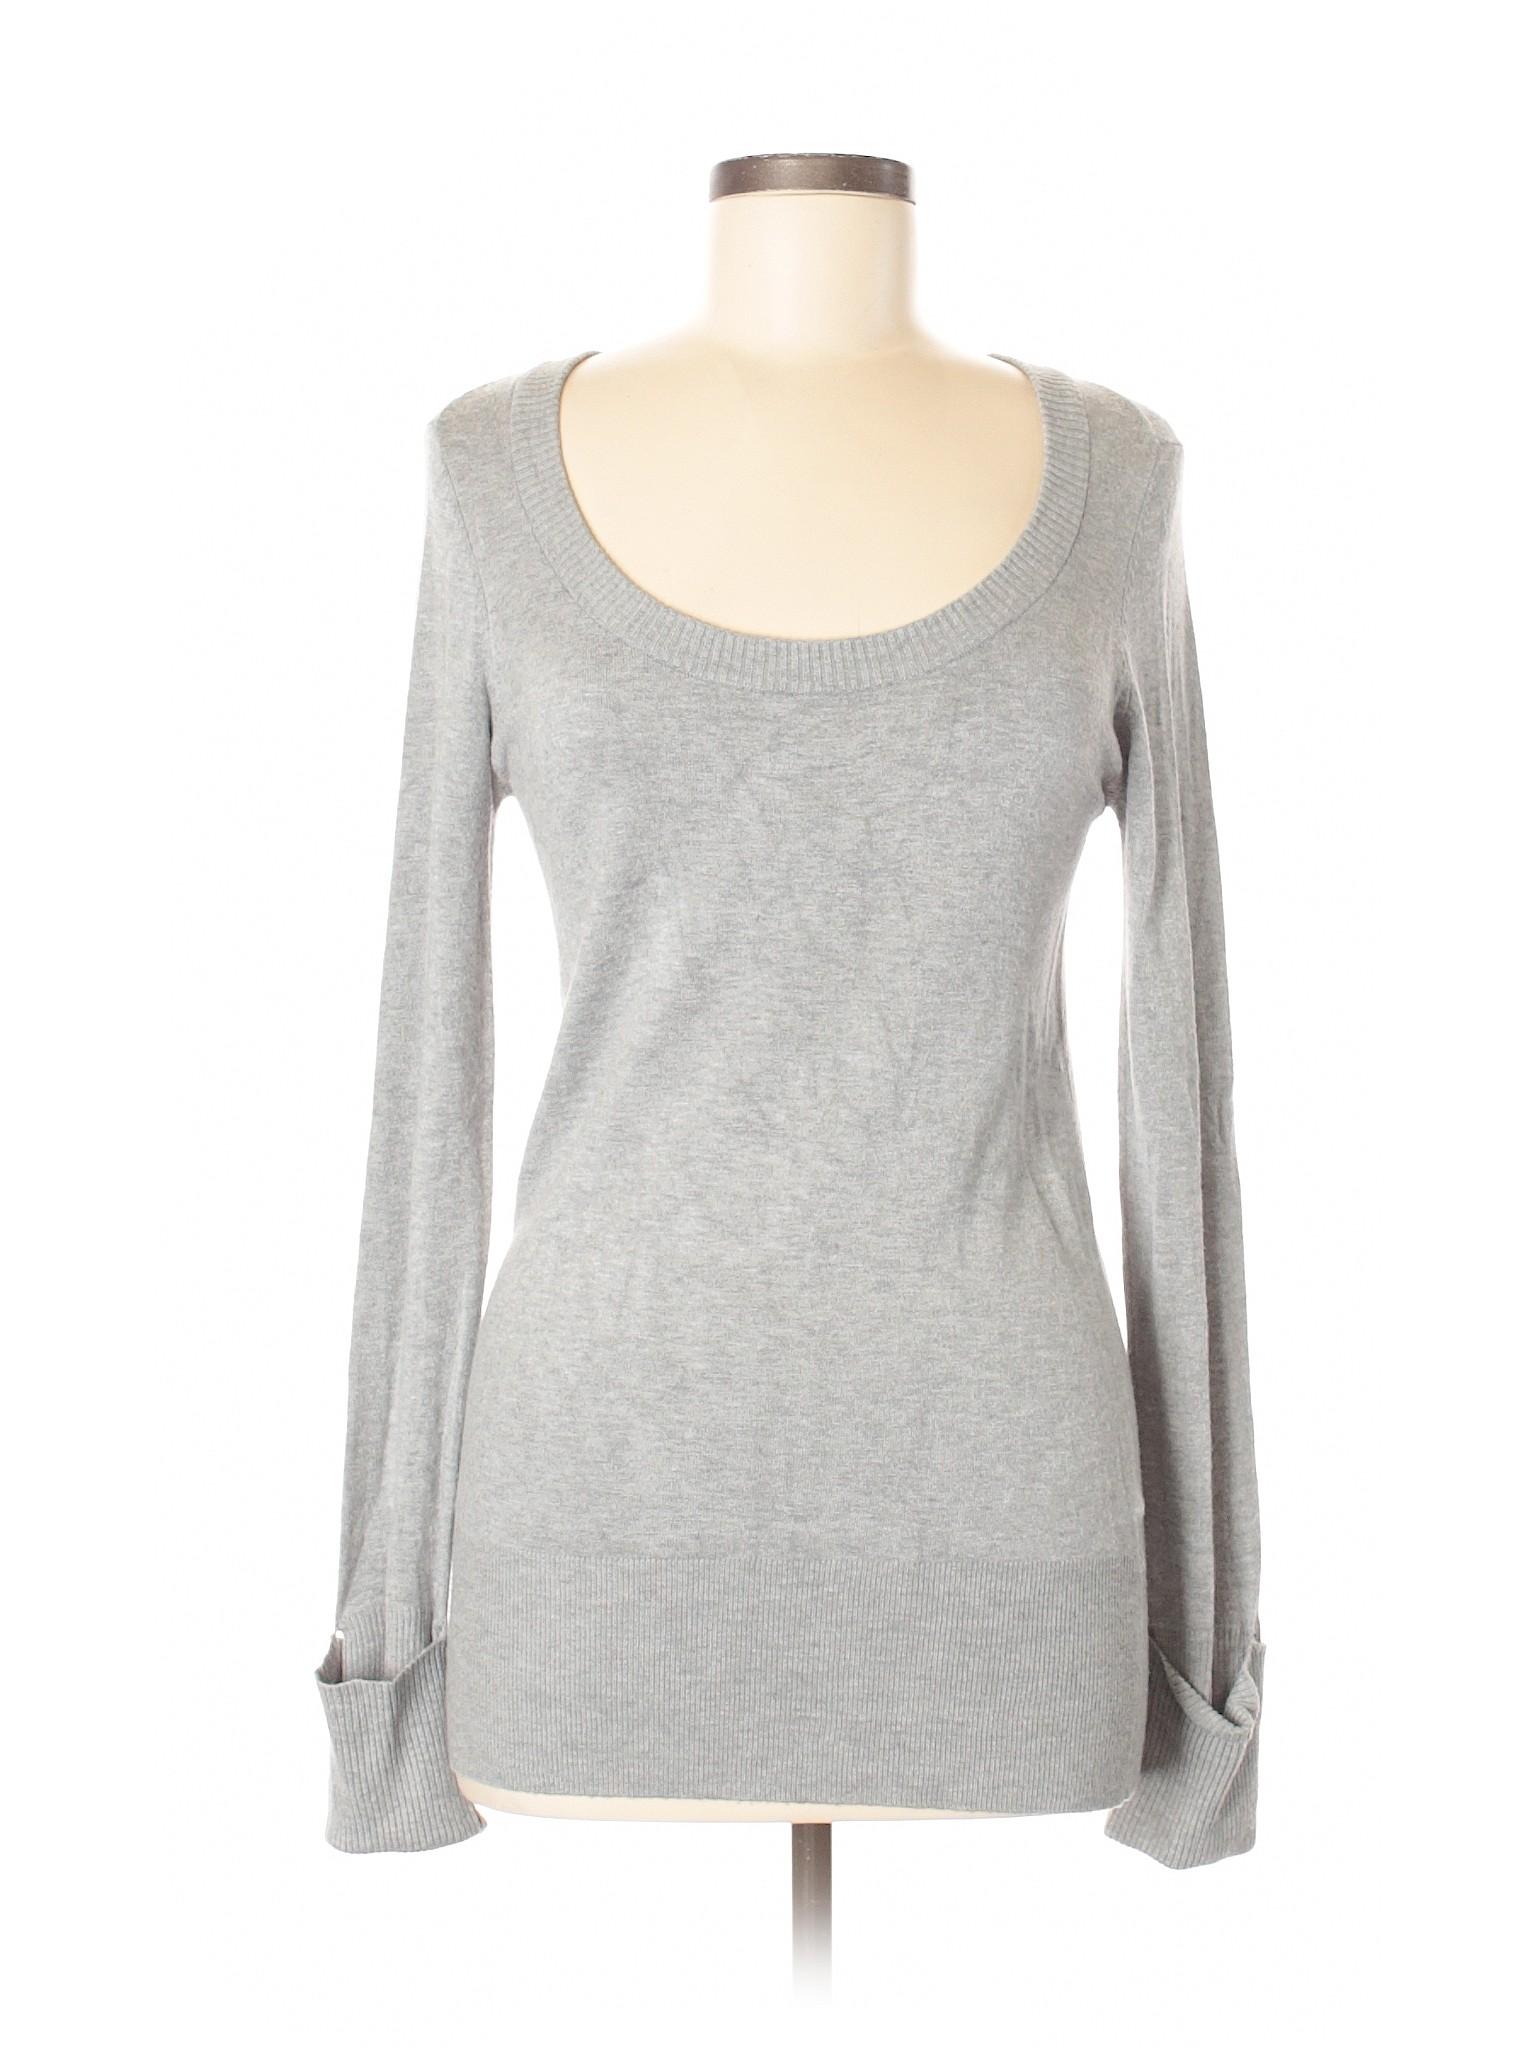 Zara Boutique Boutique Sweater Pullover Pullover Zara Sweater q5z4twxWd